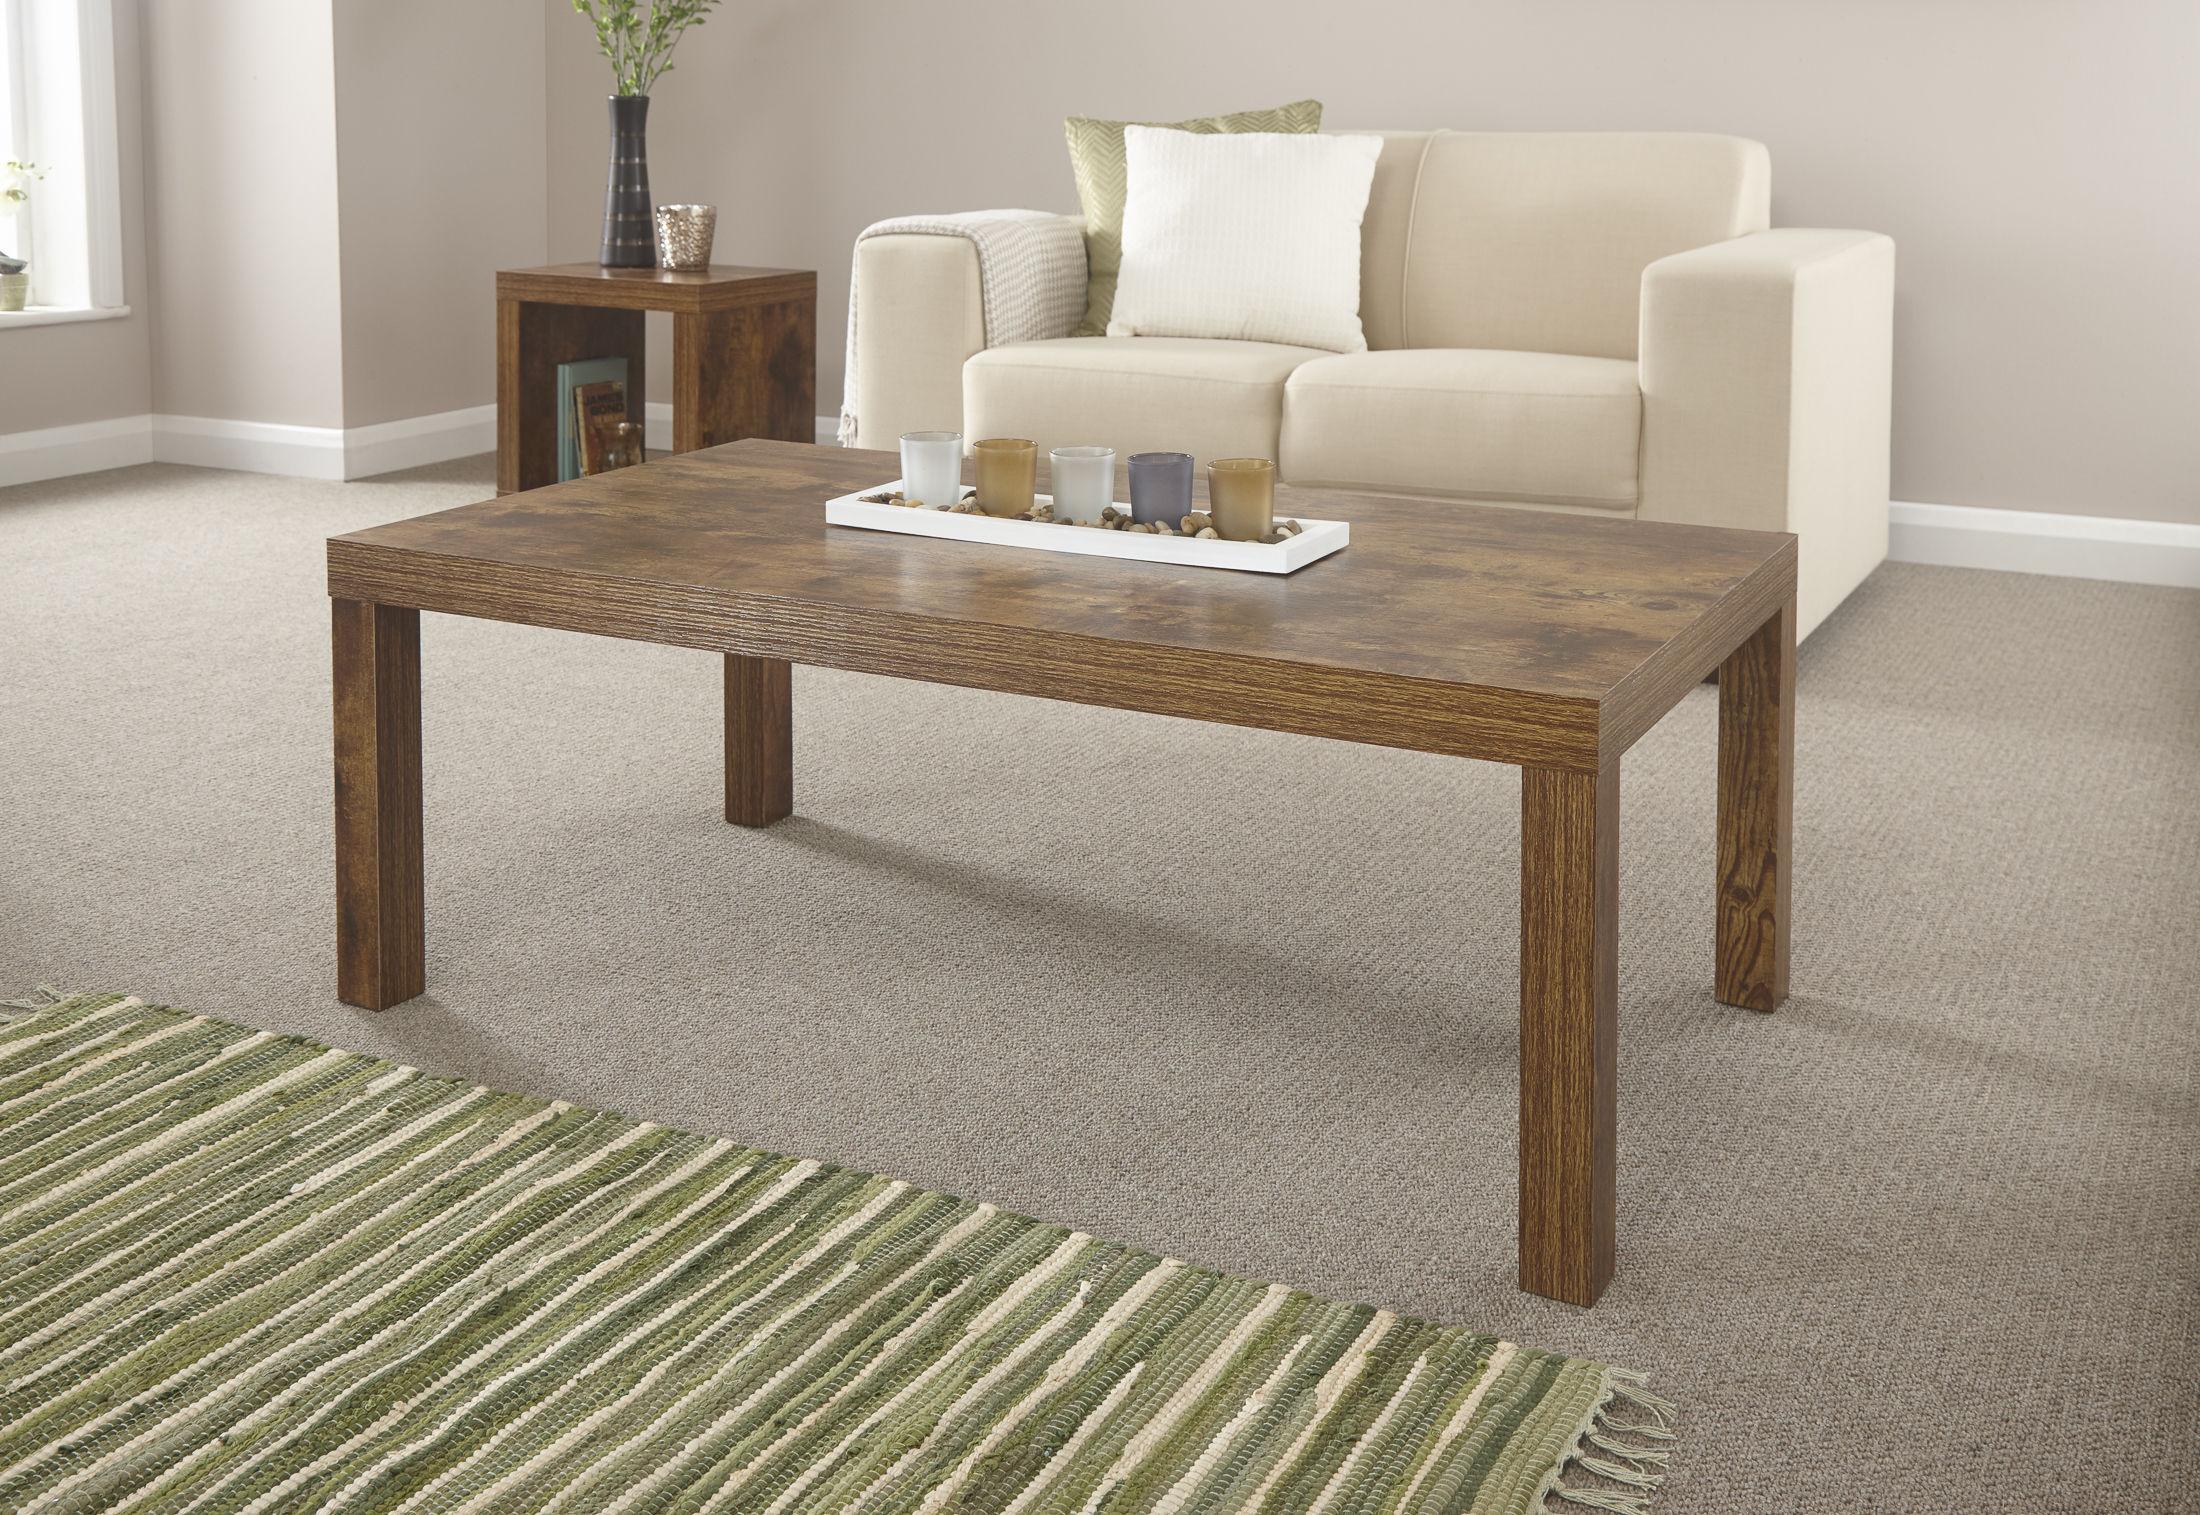 Jakarta Mango Wood Living Room Coffee Table Furniture Uk Free Delivery Ebay